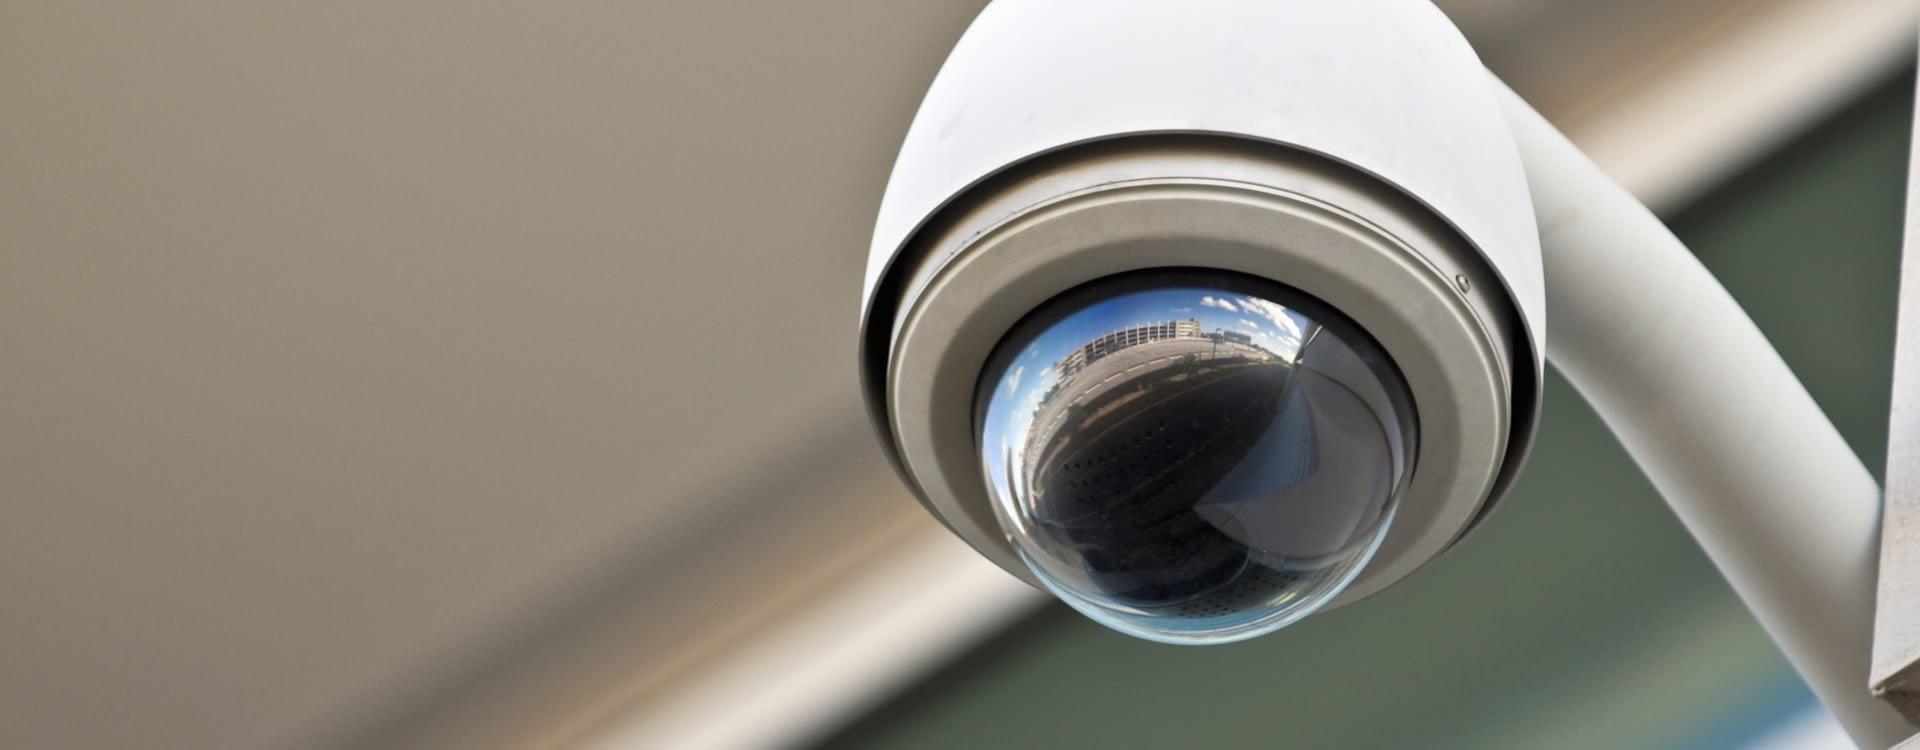 BBG security camera Halton Hills